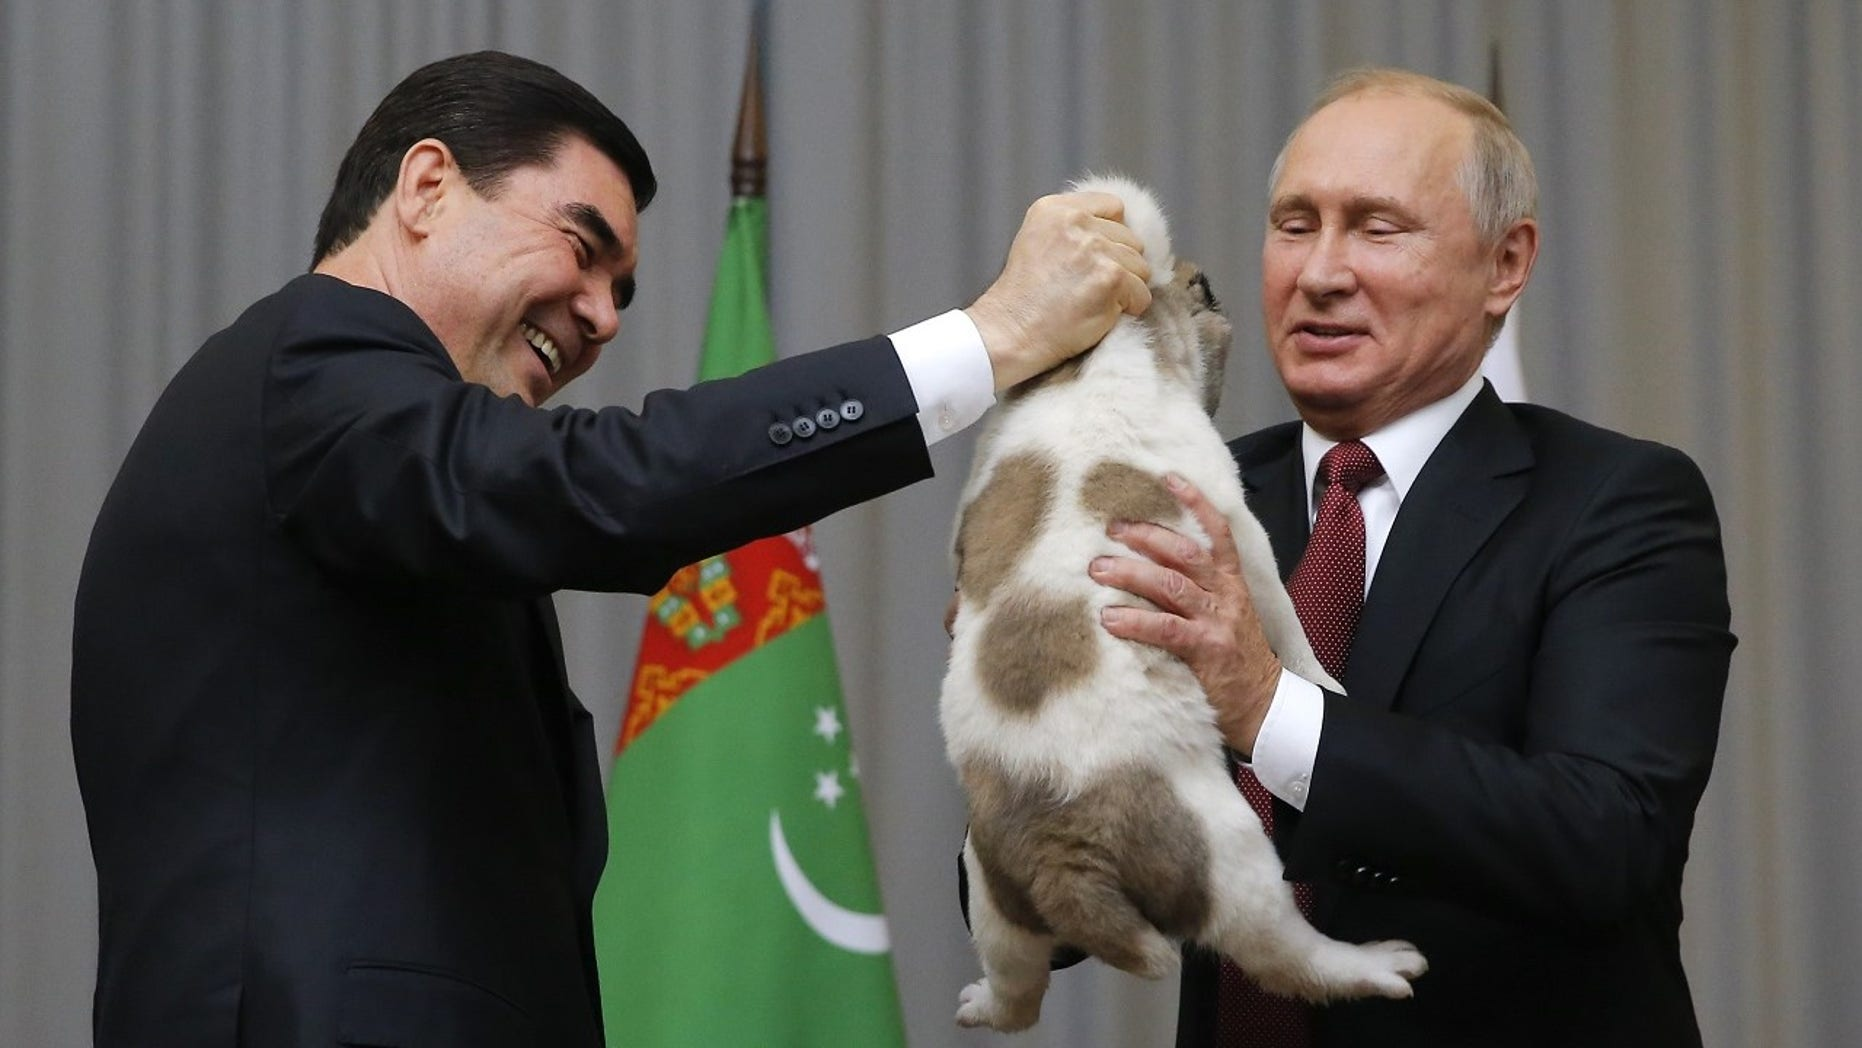 Turkmenistan's President Gurbanguly Berdimuhamedov, left, presents a Turkmen shepherd dog to Russian President Vladimir Putin.